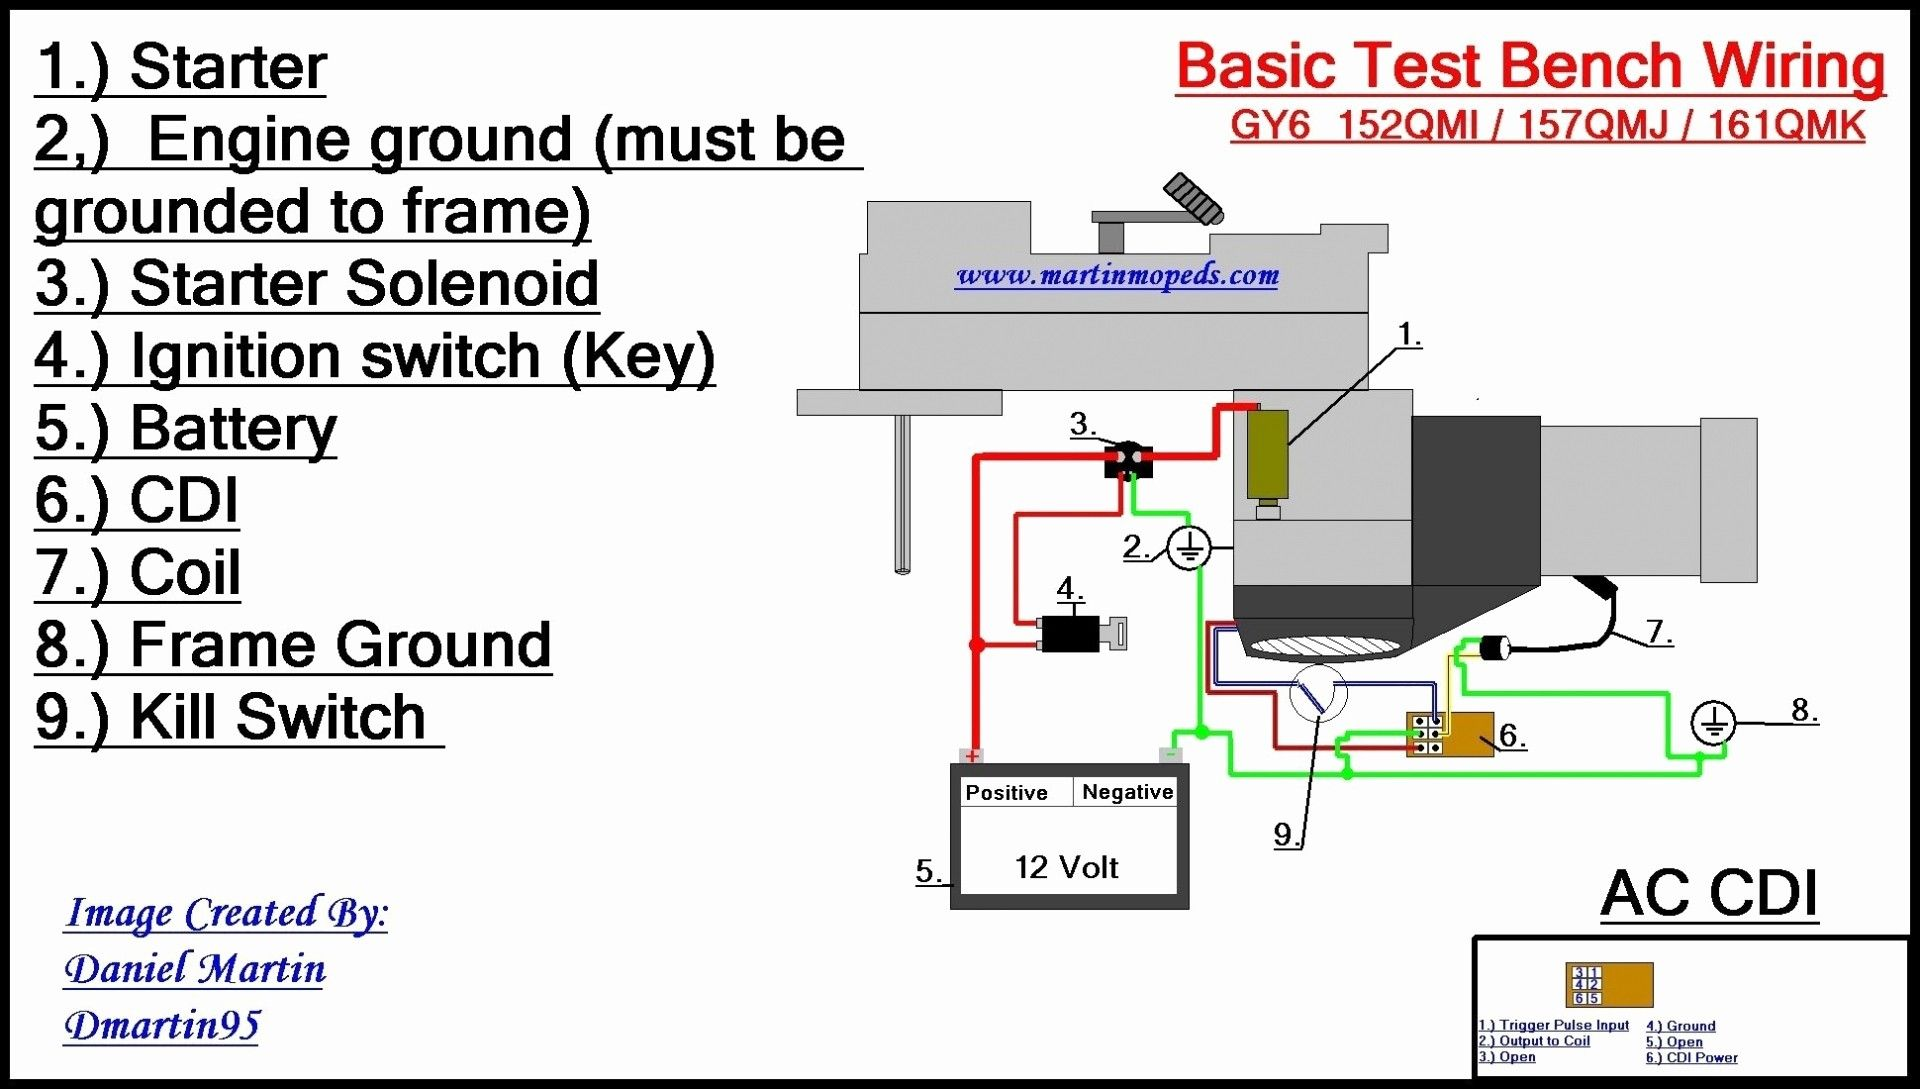 Unique Wiring Diagram For Emergency Key Switch Diagram Diagramsample Diagramtemplate Wiringdiagram Kill Switch Electrical Diagram Electrical Wiring Diagram